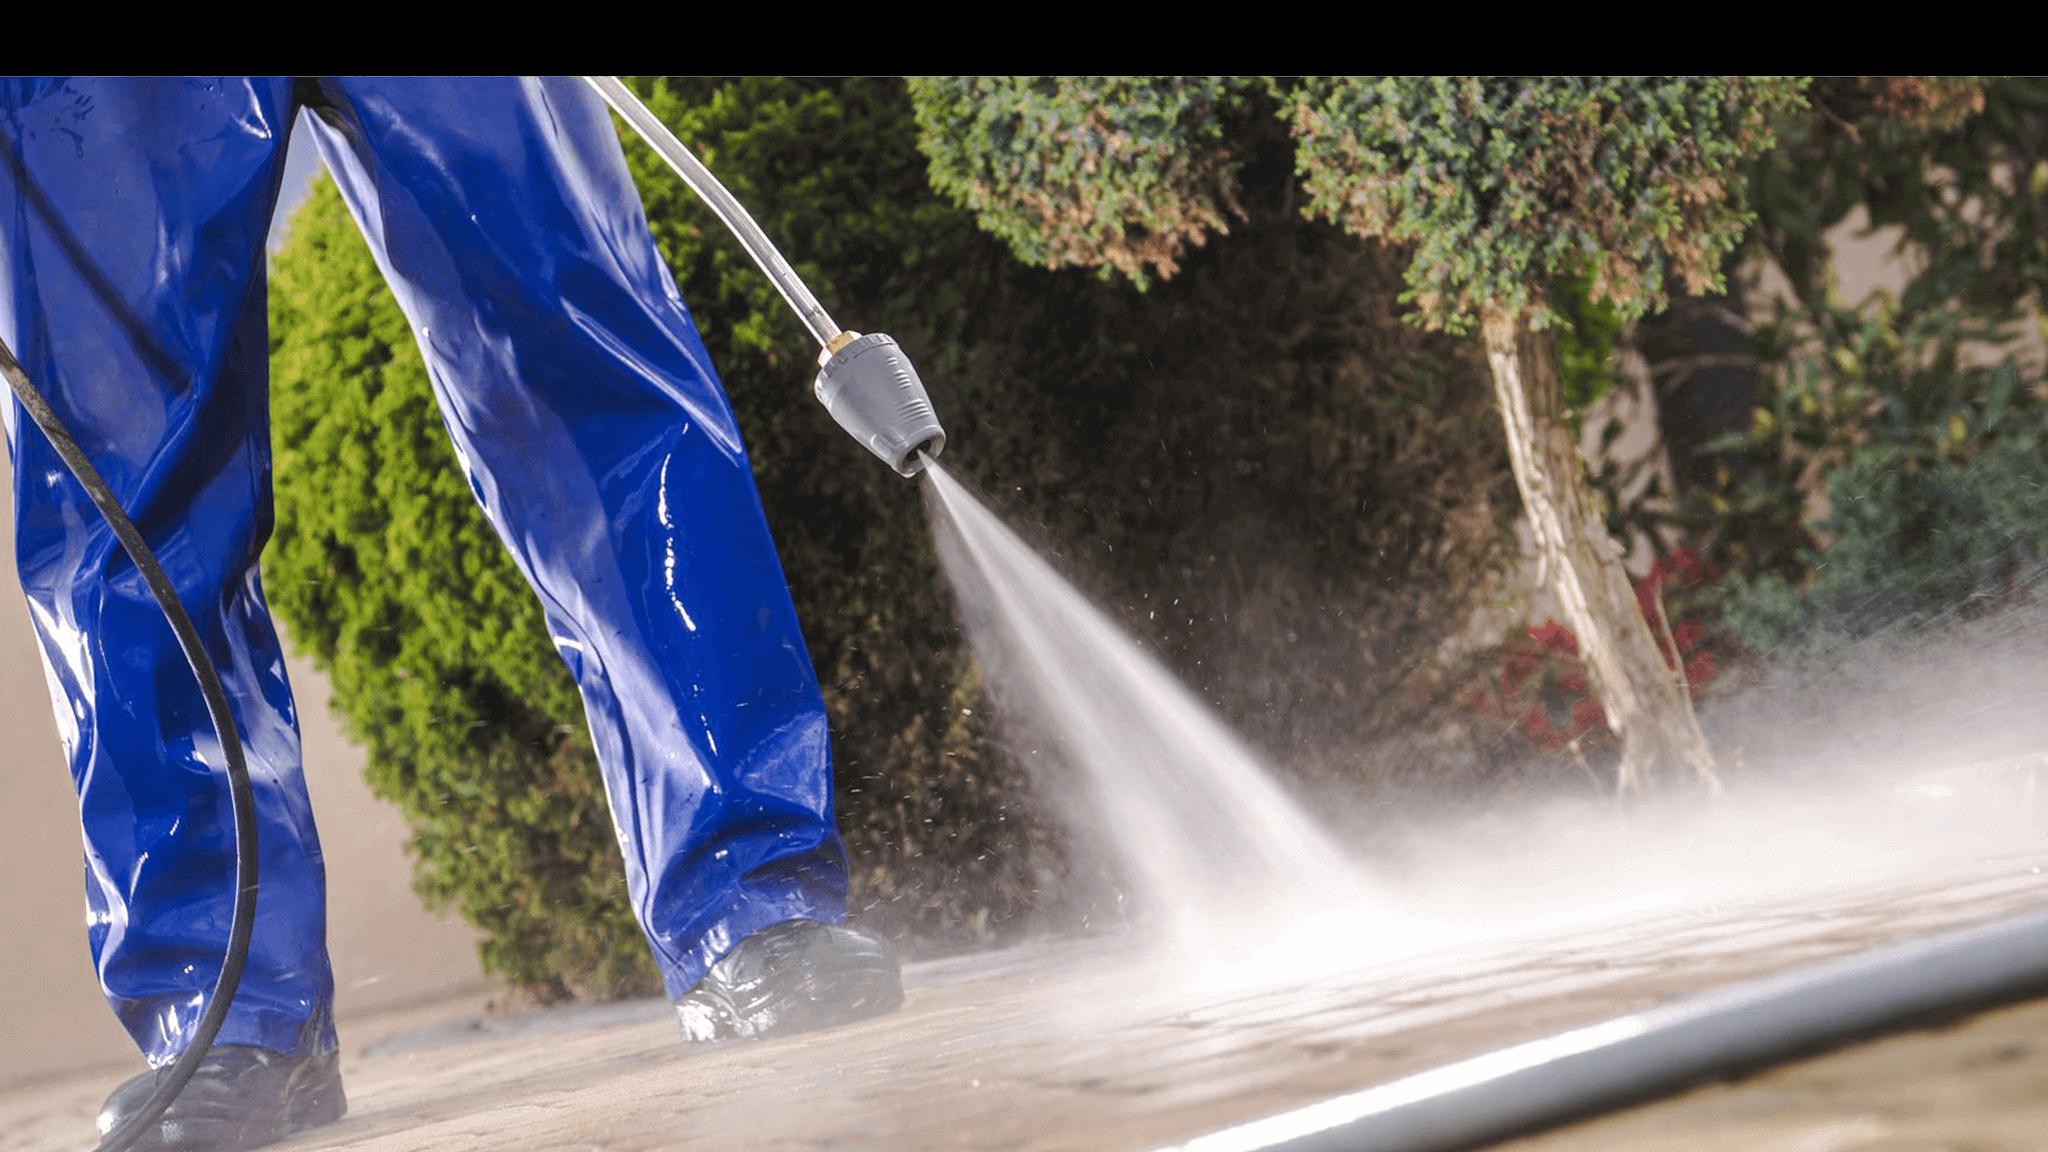 man-about-to-finish-power-washing-driveway